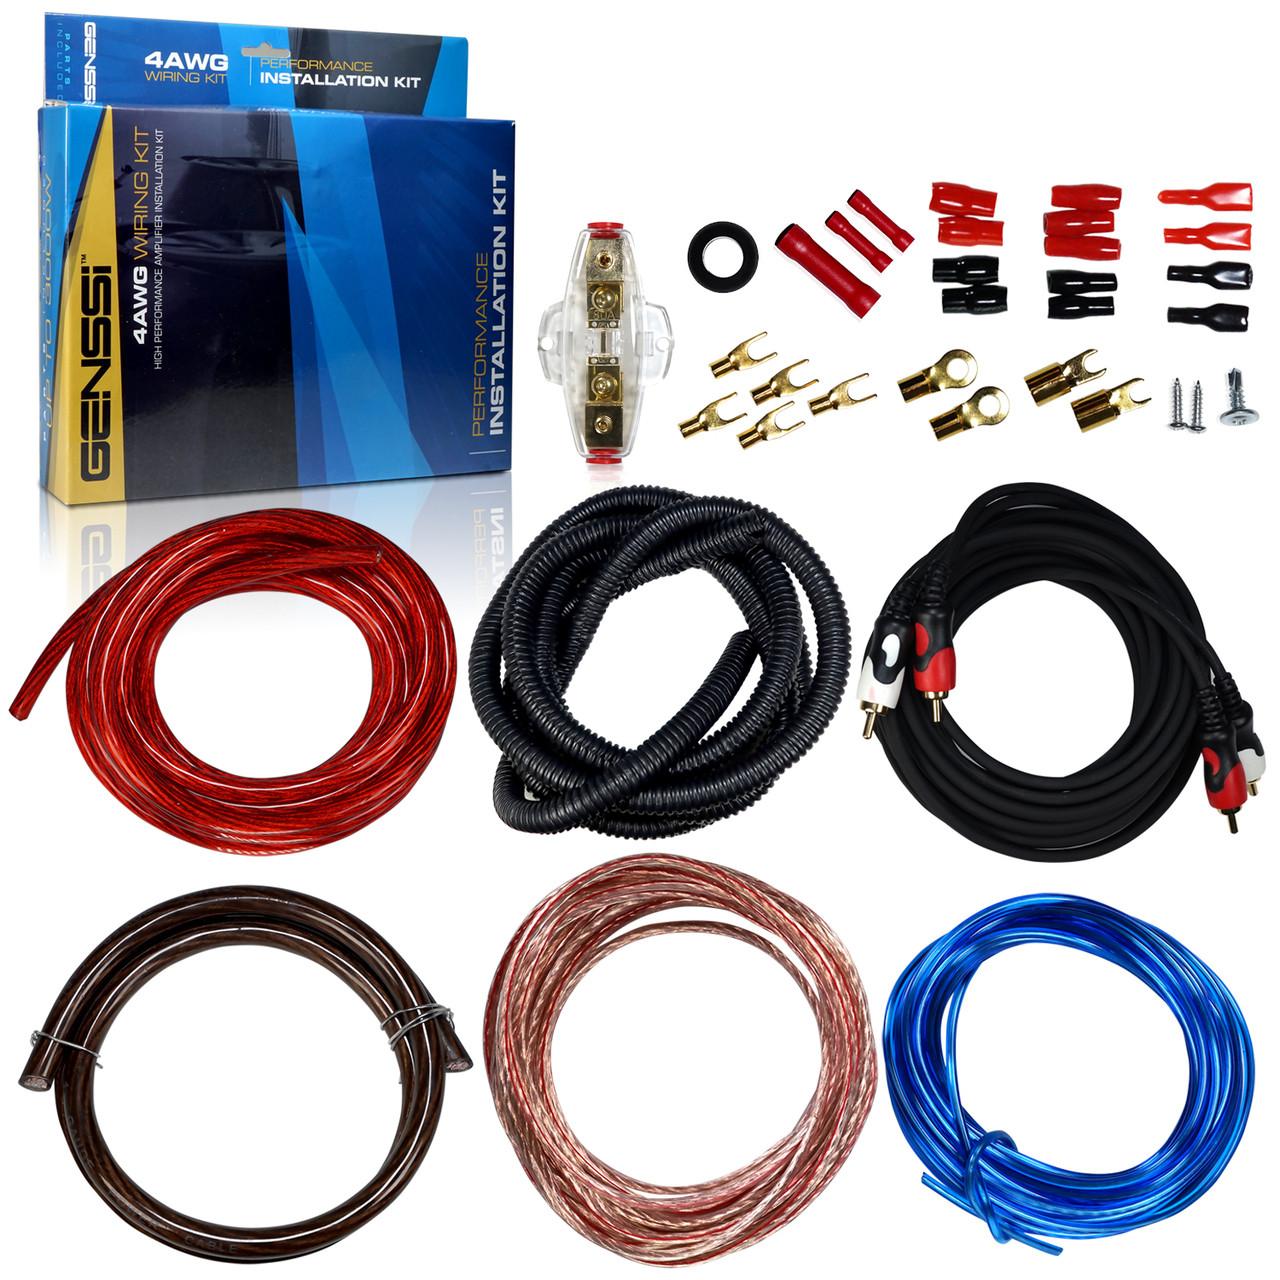 small resolution of 4awg car audio installation wiring kit 4 gauge genssi 4 gauge wiring kit car audio